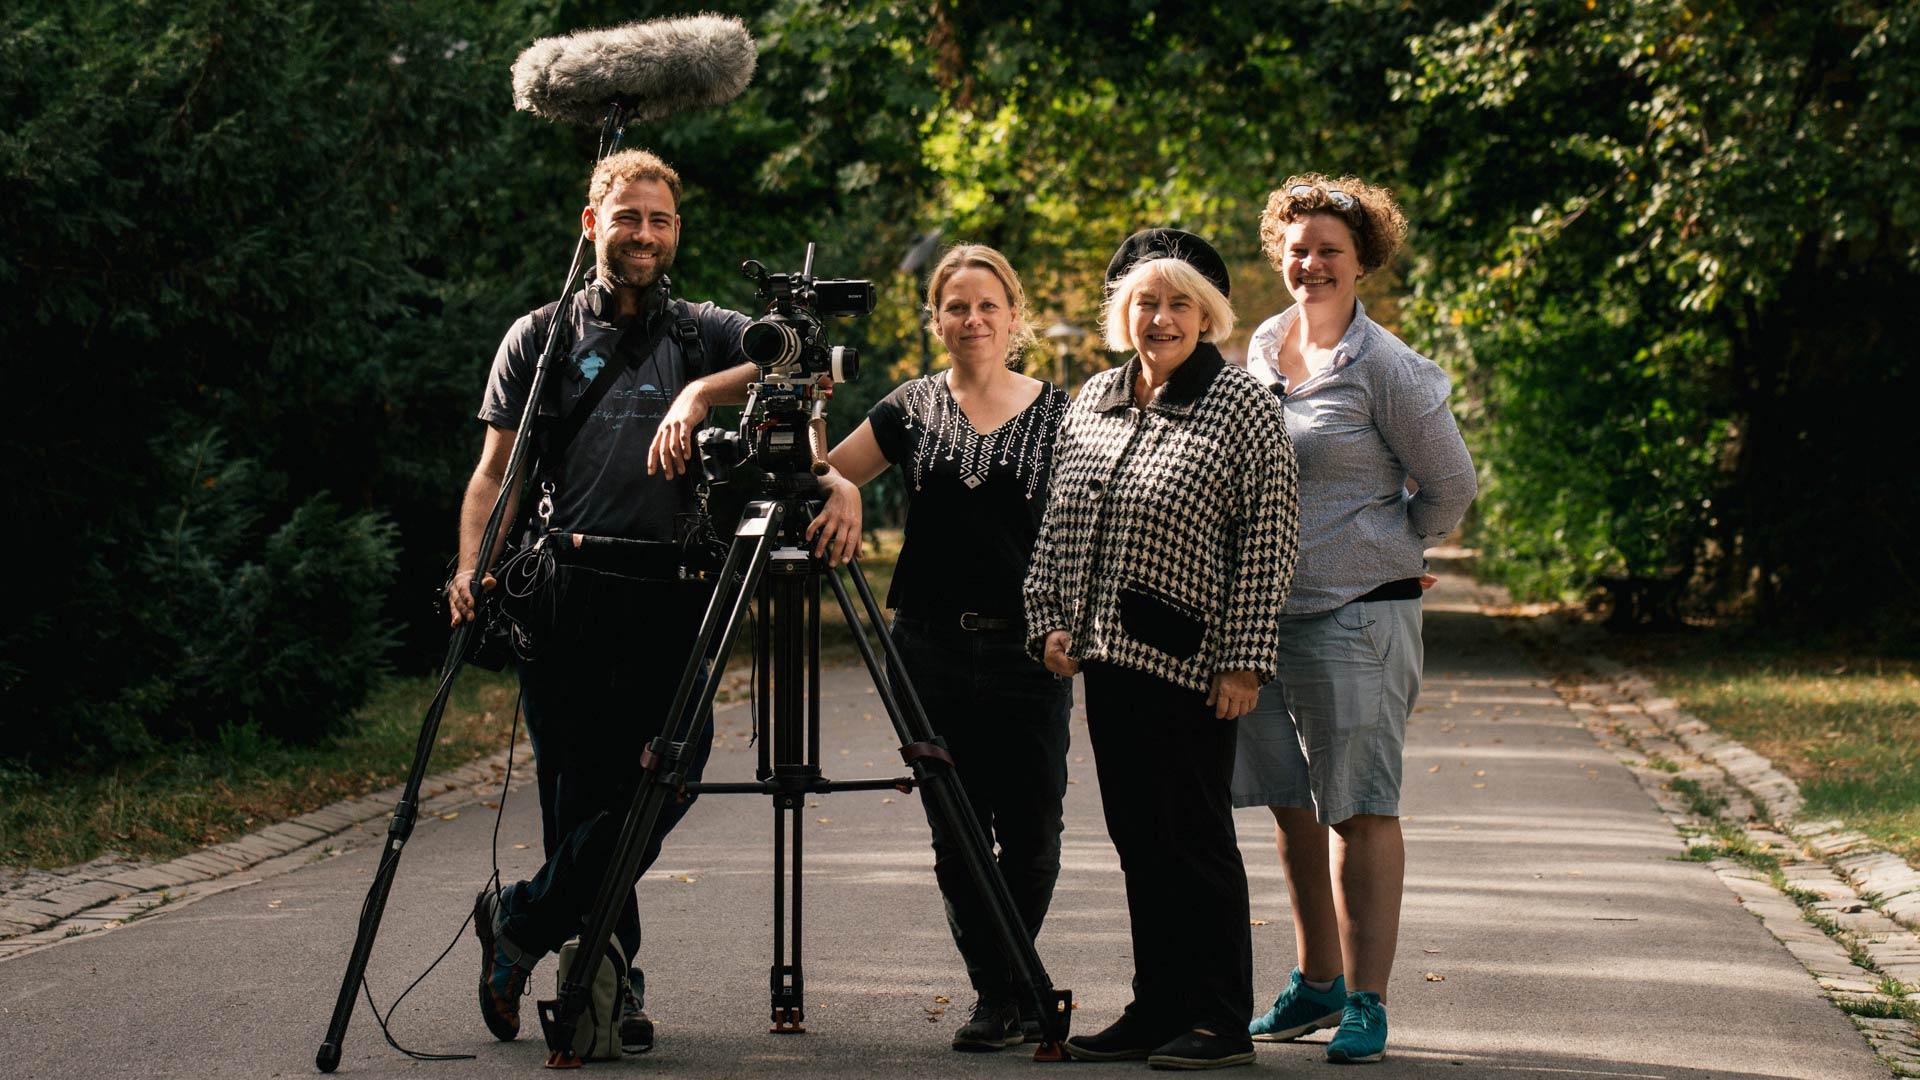 Team Uferfrauen - Kamerafrau Anne Misselwitz